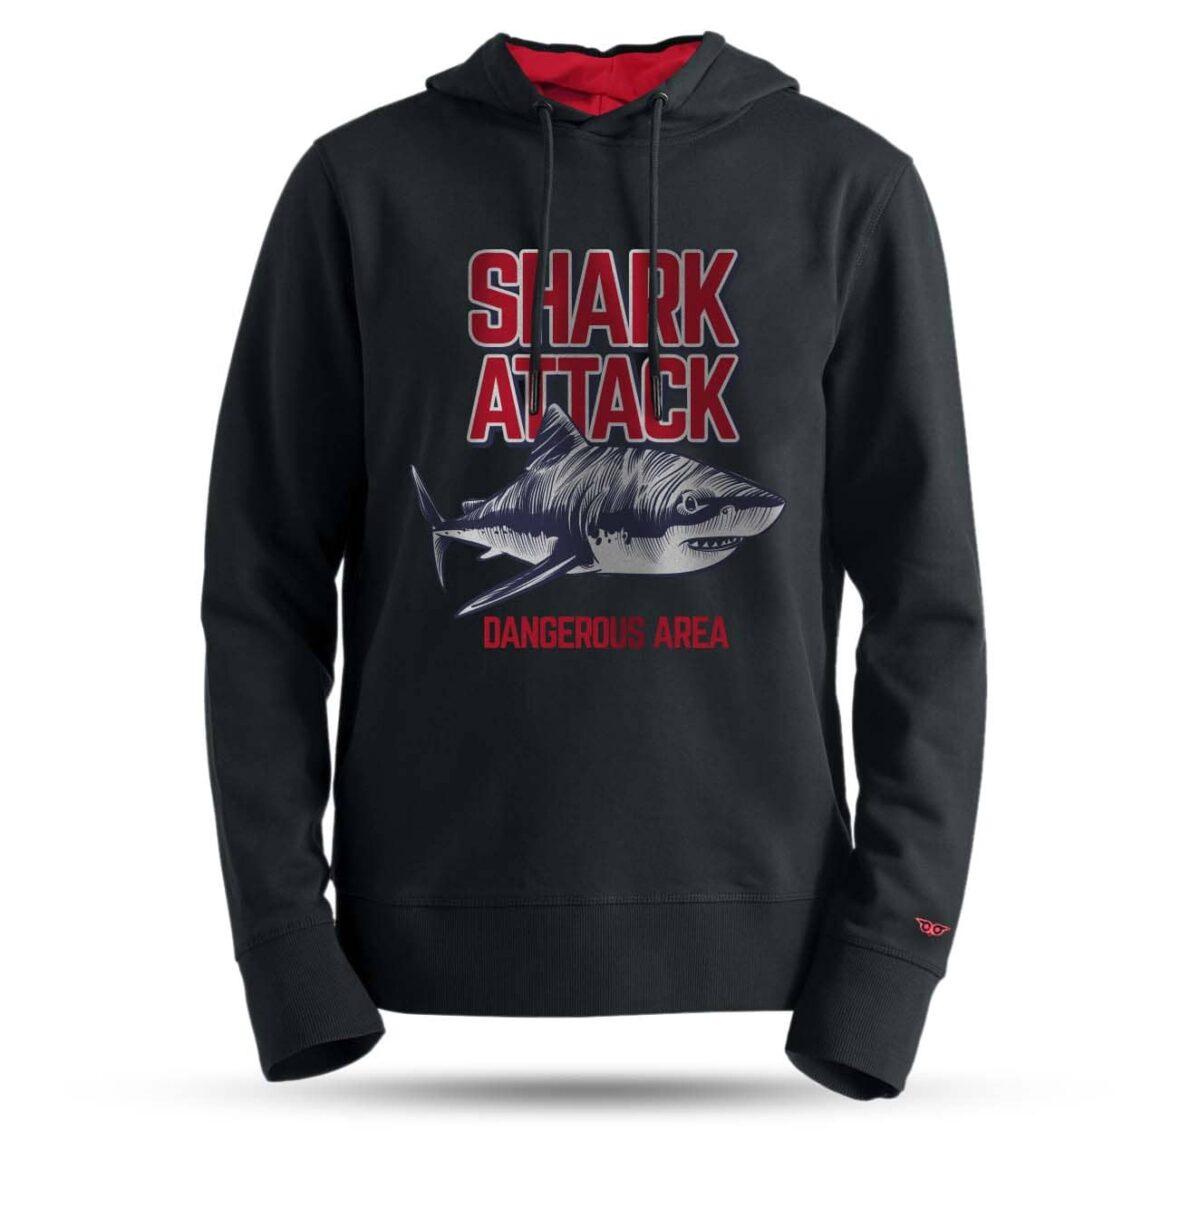 tarrzz-tasarim-kapsonlu-sweatshirt-kopekbaligi-saldirisi-shark-attack